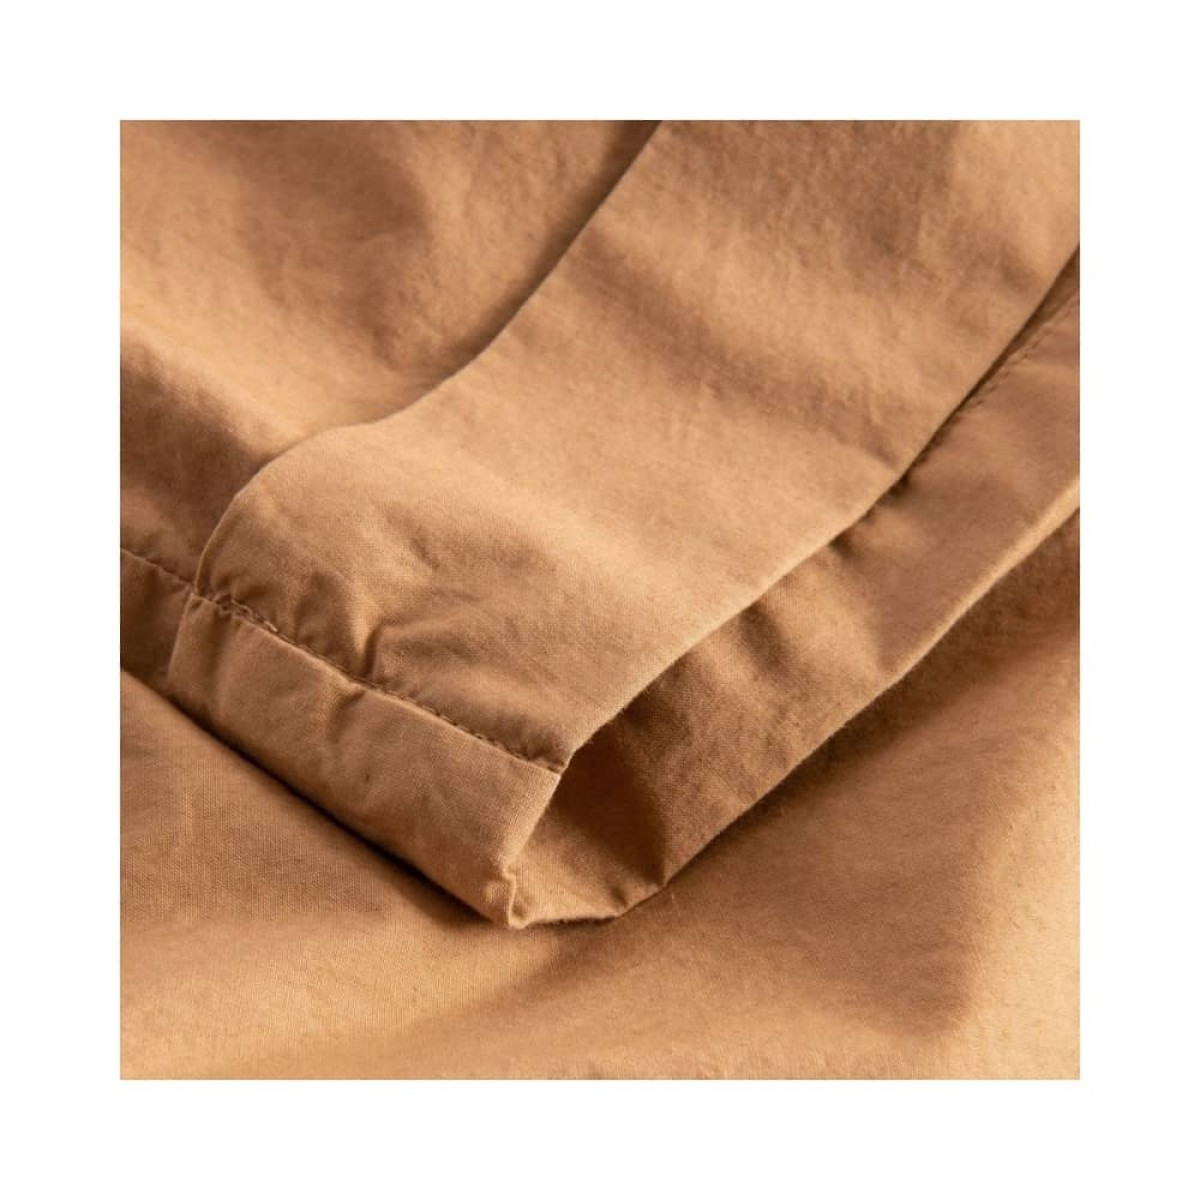 peony shorts - light brown - opslag